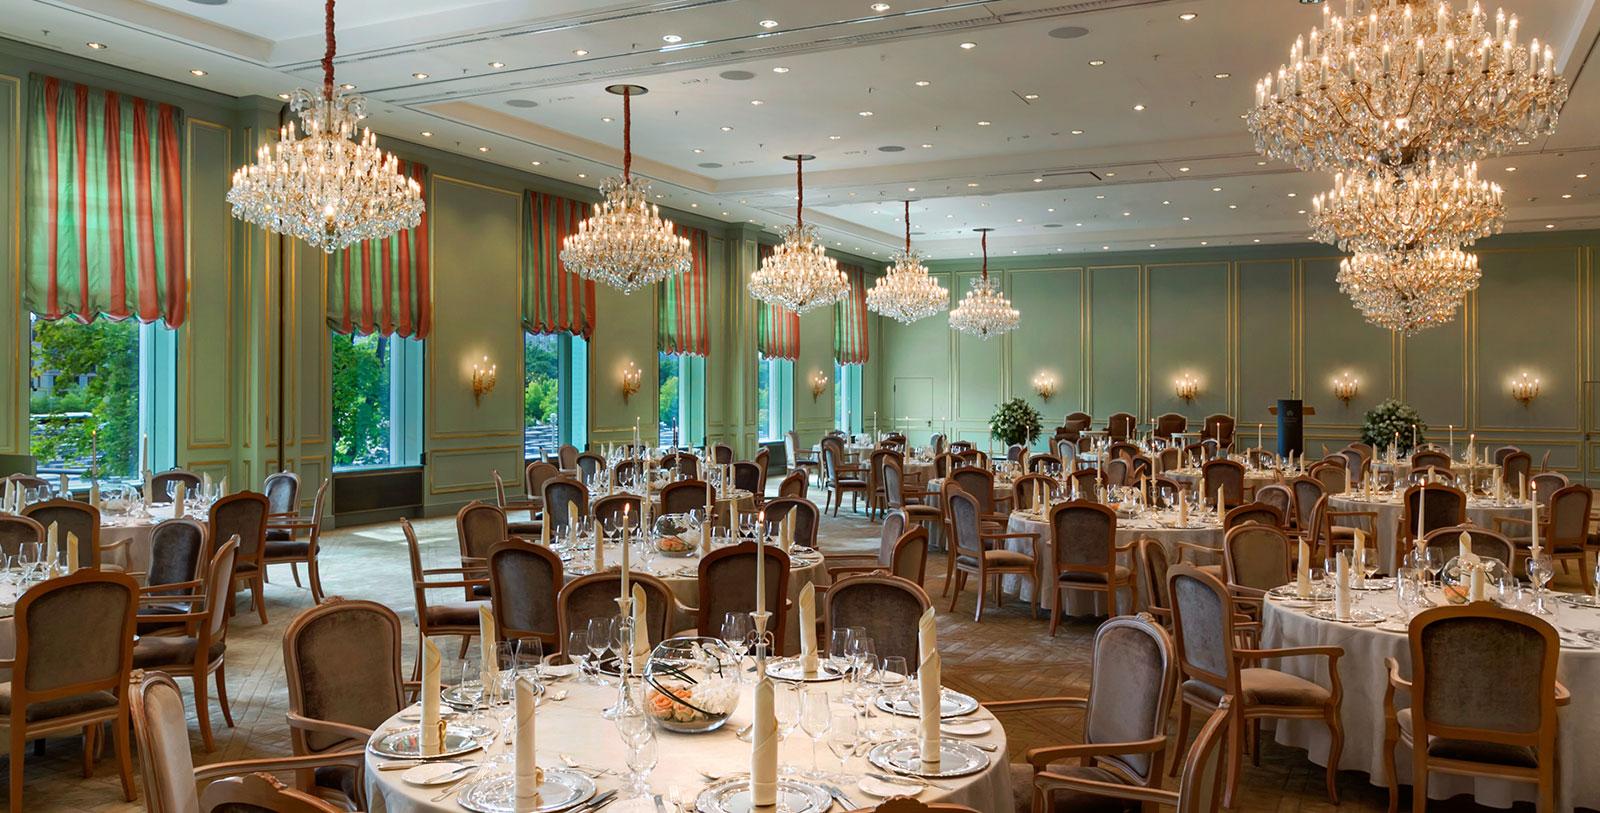 Image of Event Dining, Hotel Adlon Kempinski, Berlin, Germany, 1907, Member of Historic Hotels Worldwide, Weddings